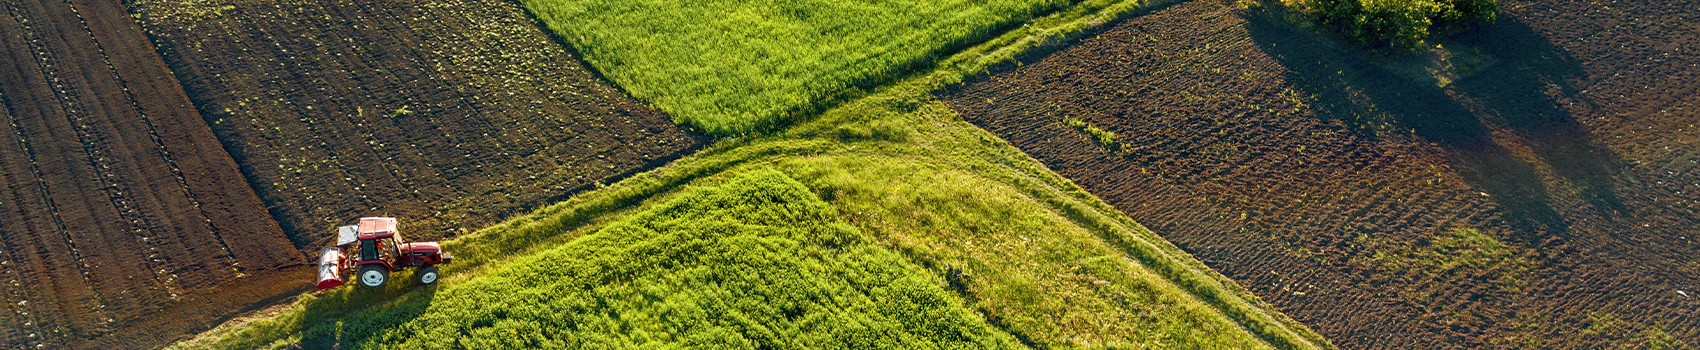 sce-domaine-production-agricole-durable_1700x350